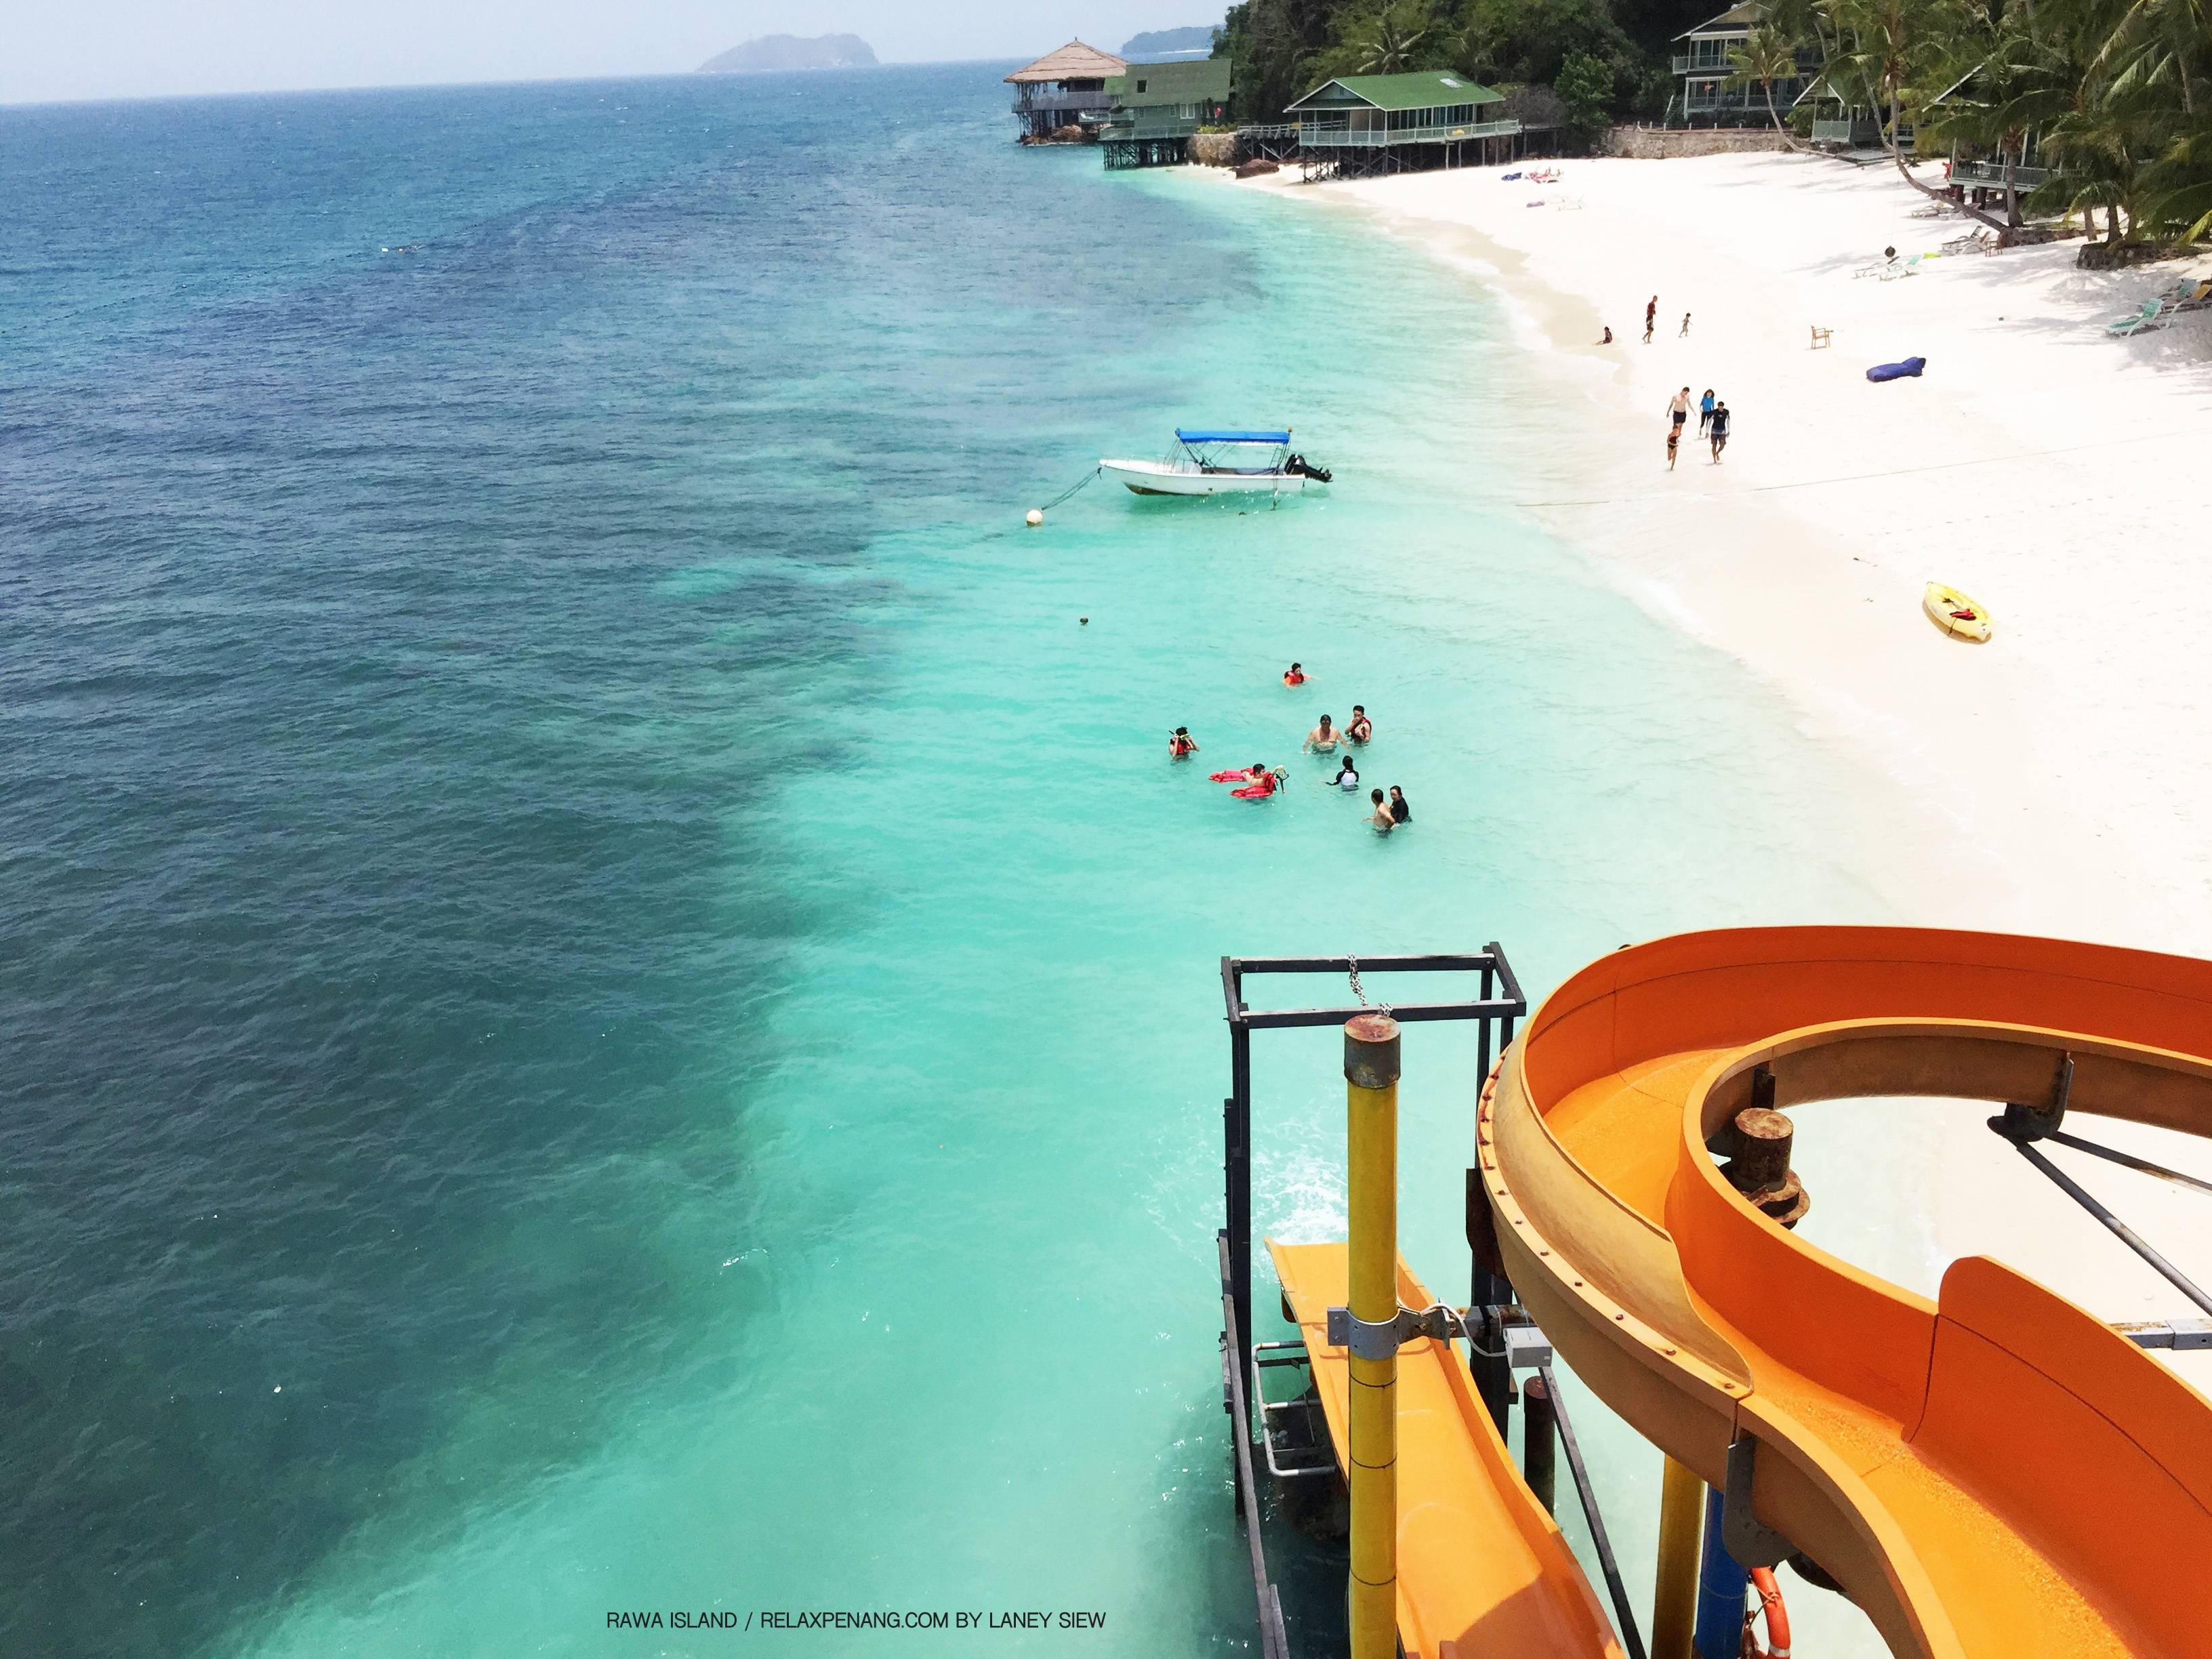 Rawa Island Johor Bahru Water Slide